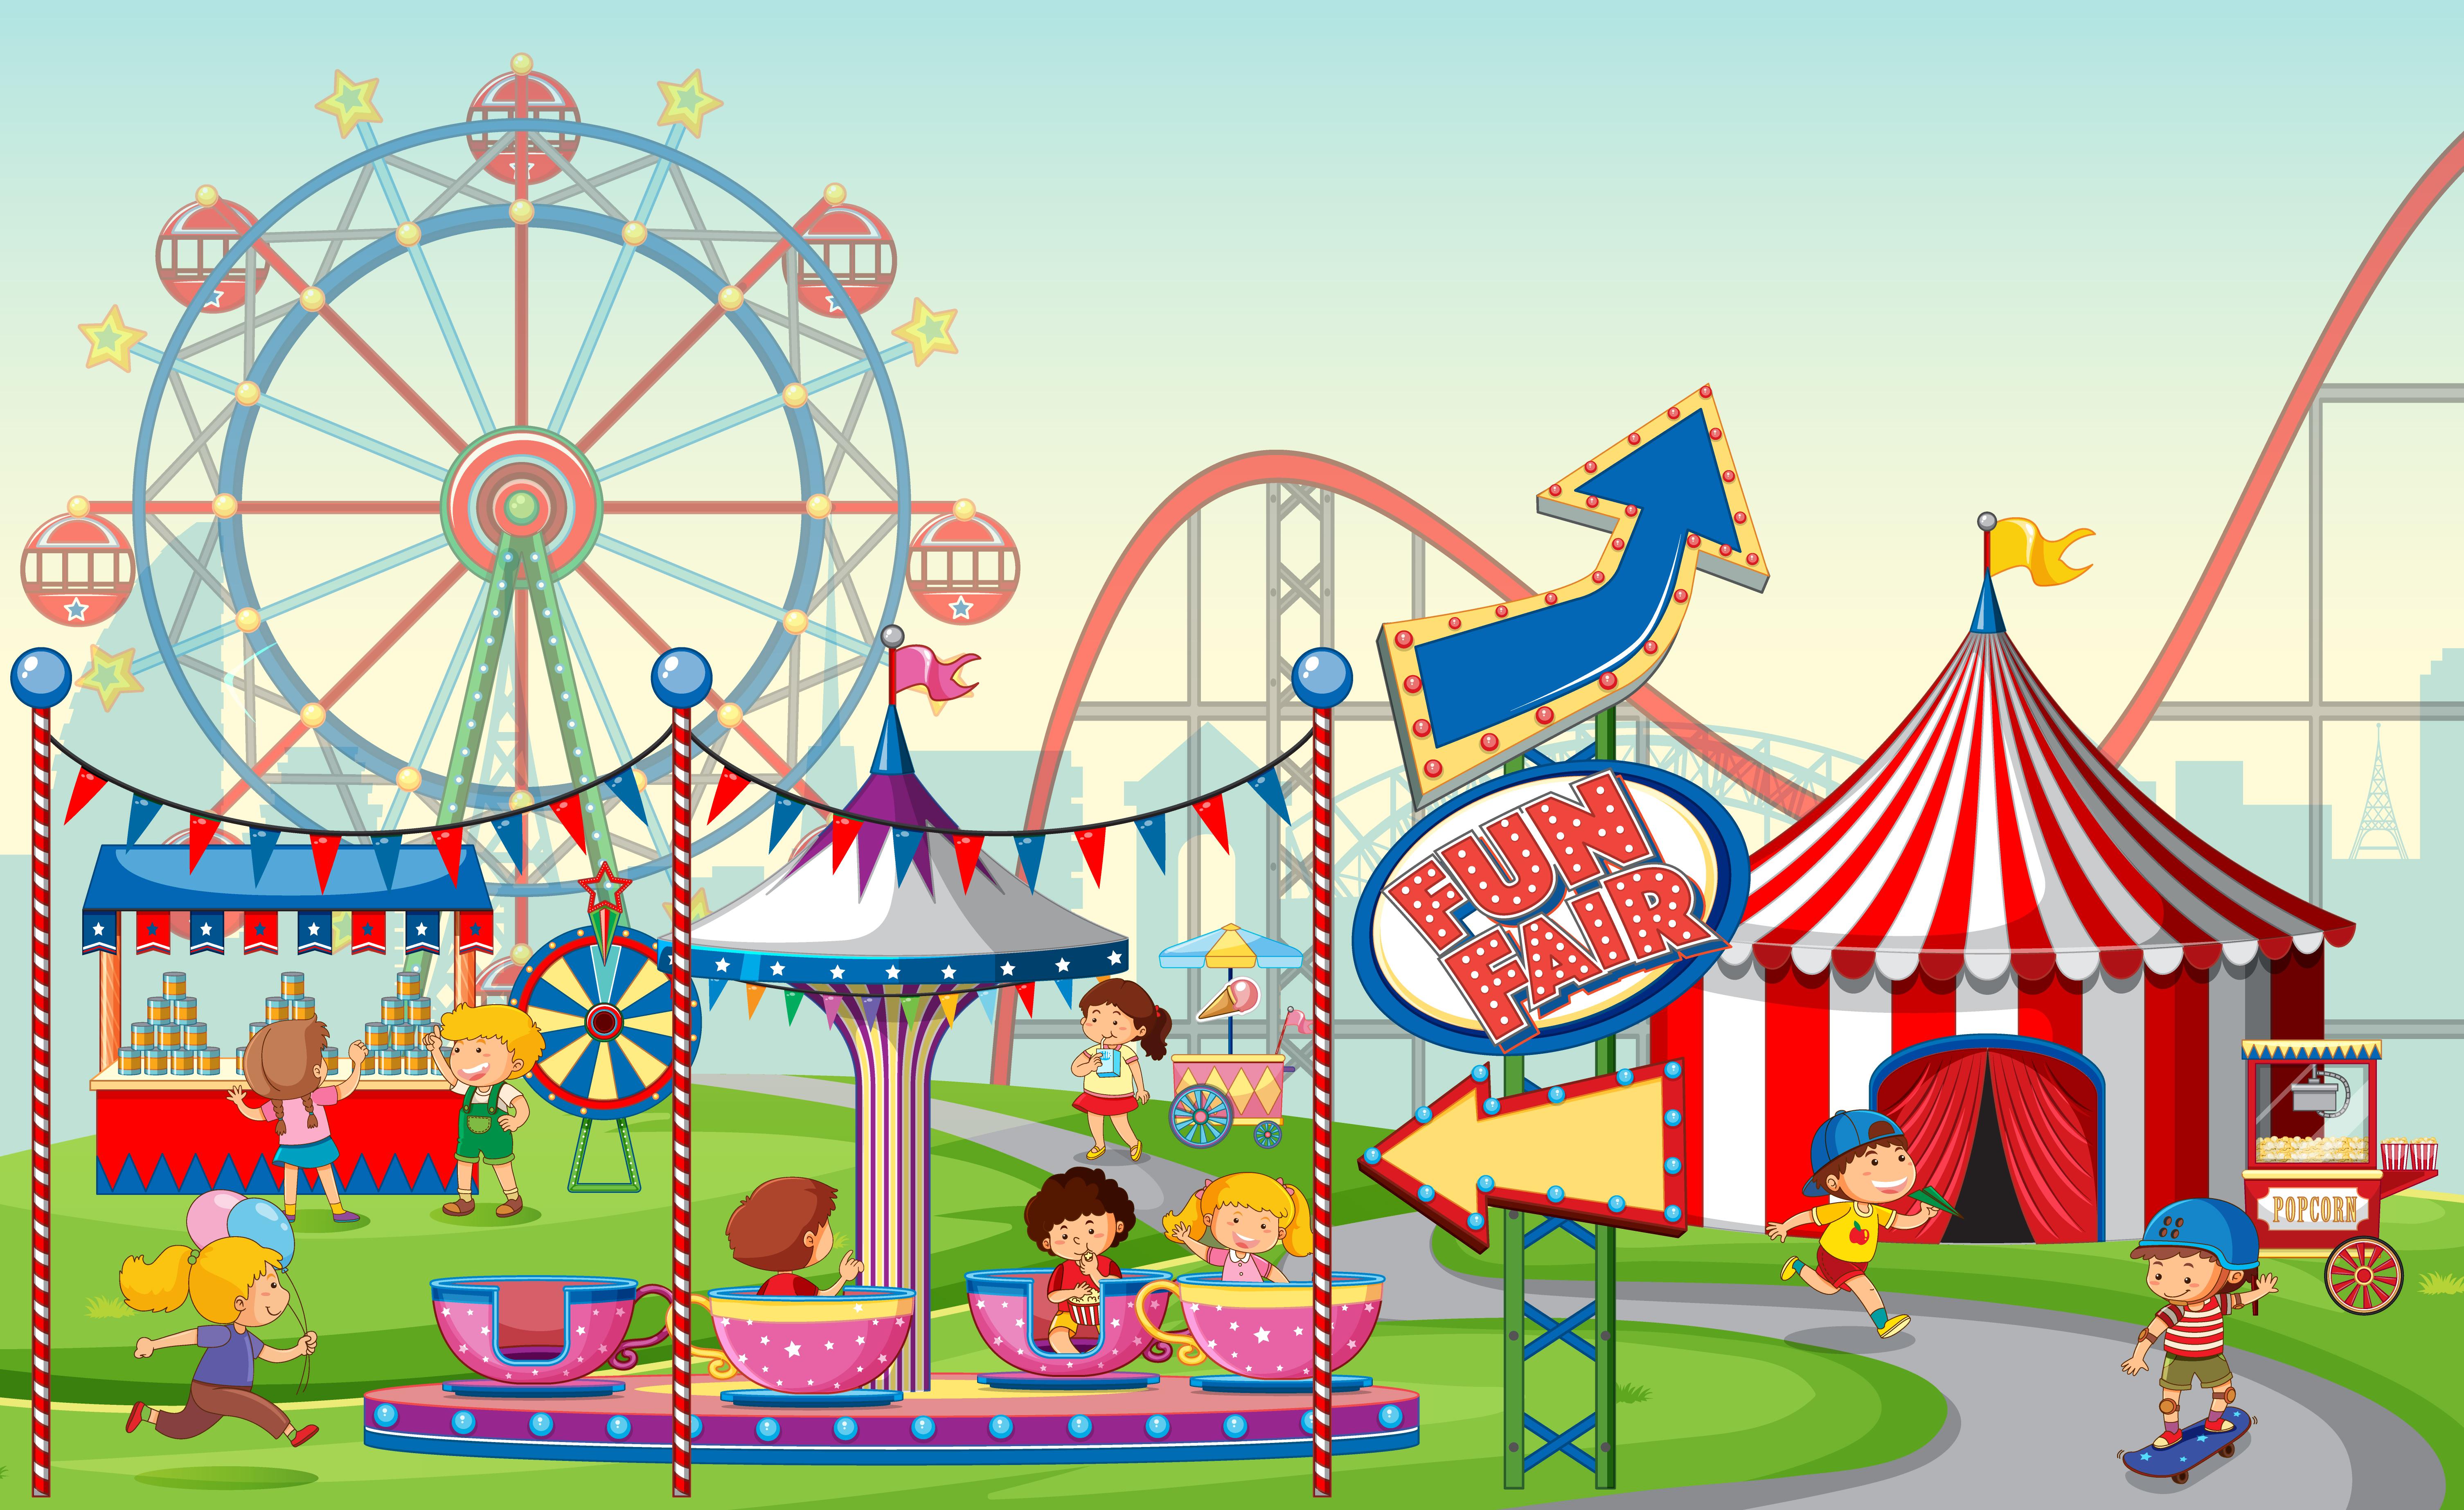 An Outdoor Fun Fair Scene With Kids